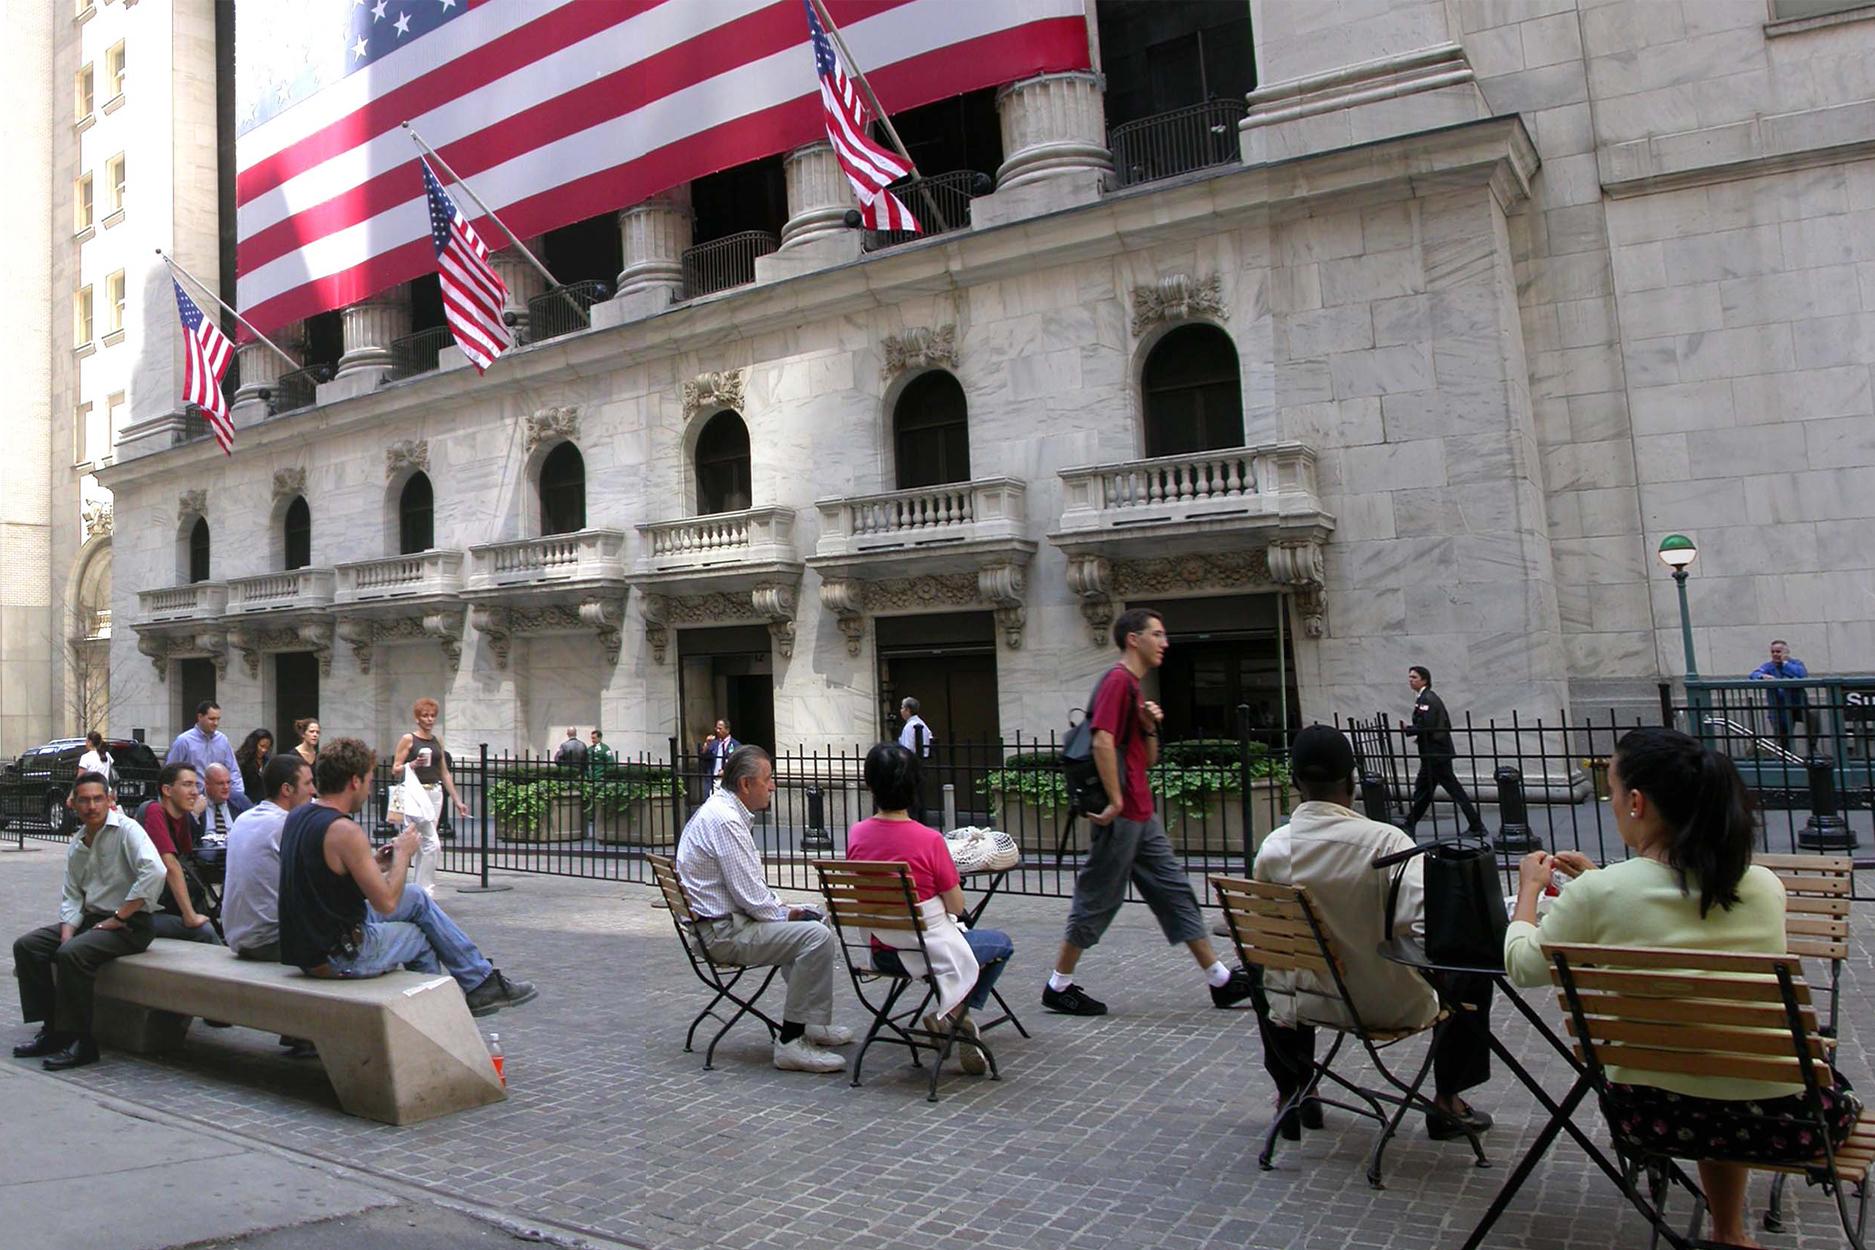 NYSE landscape architecture